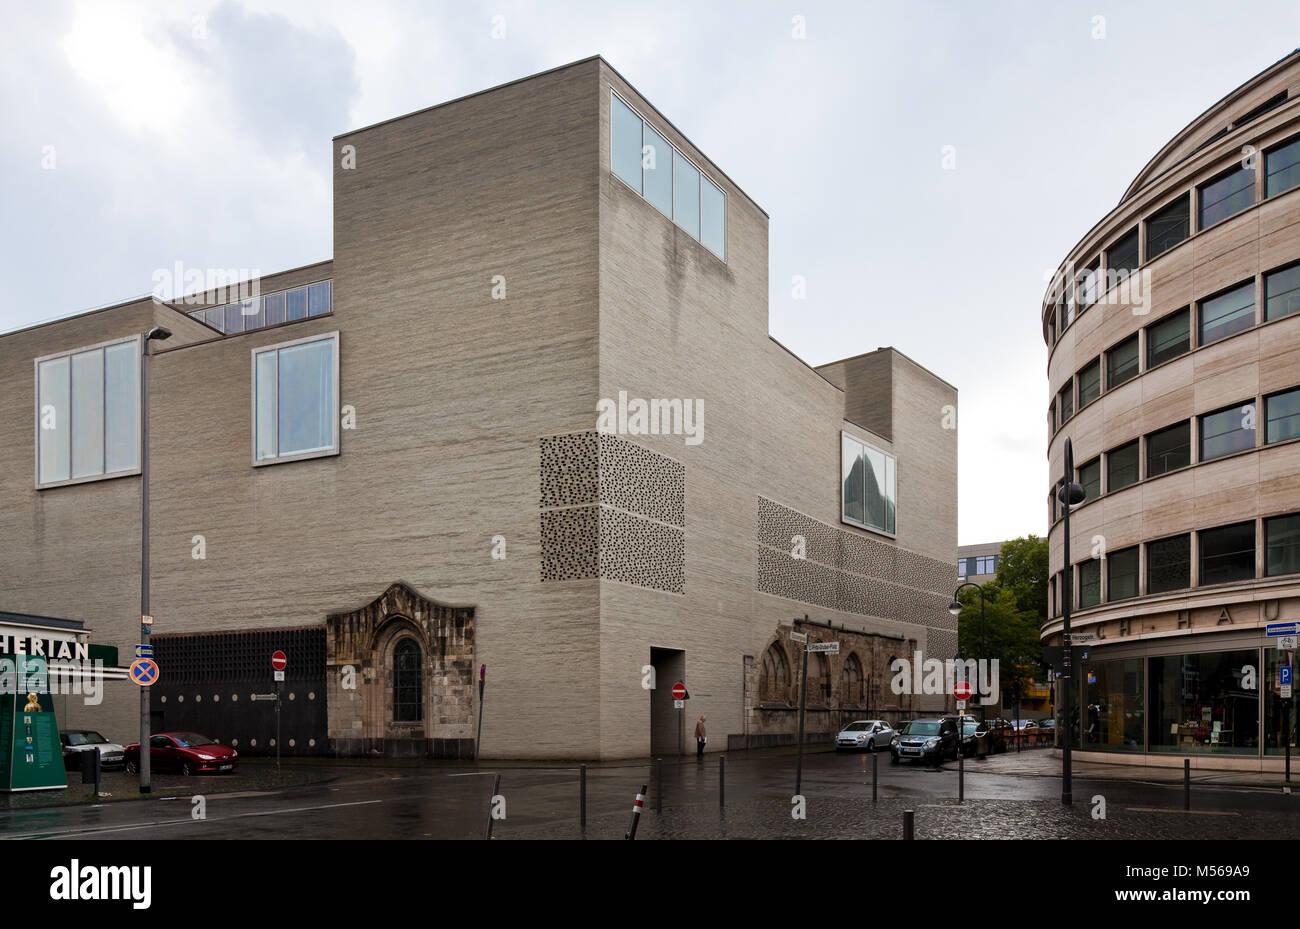 Köln Kunstmuseum KOLUMBA Erbaut 1997-2007 unter Einbeziehung von Resten der Kirche St. Kolumba Architekt Peter Zumthor Stockfoto